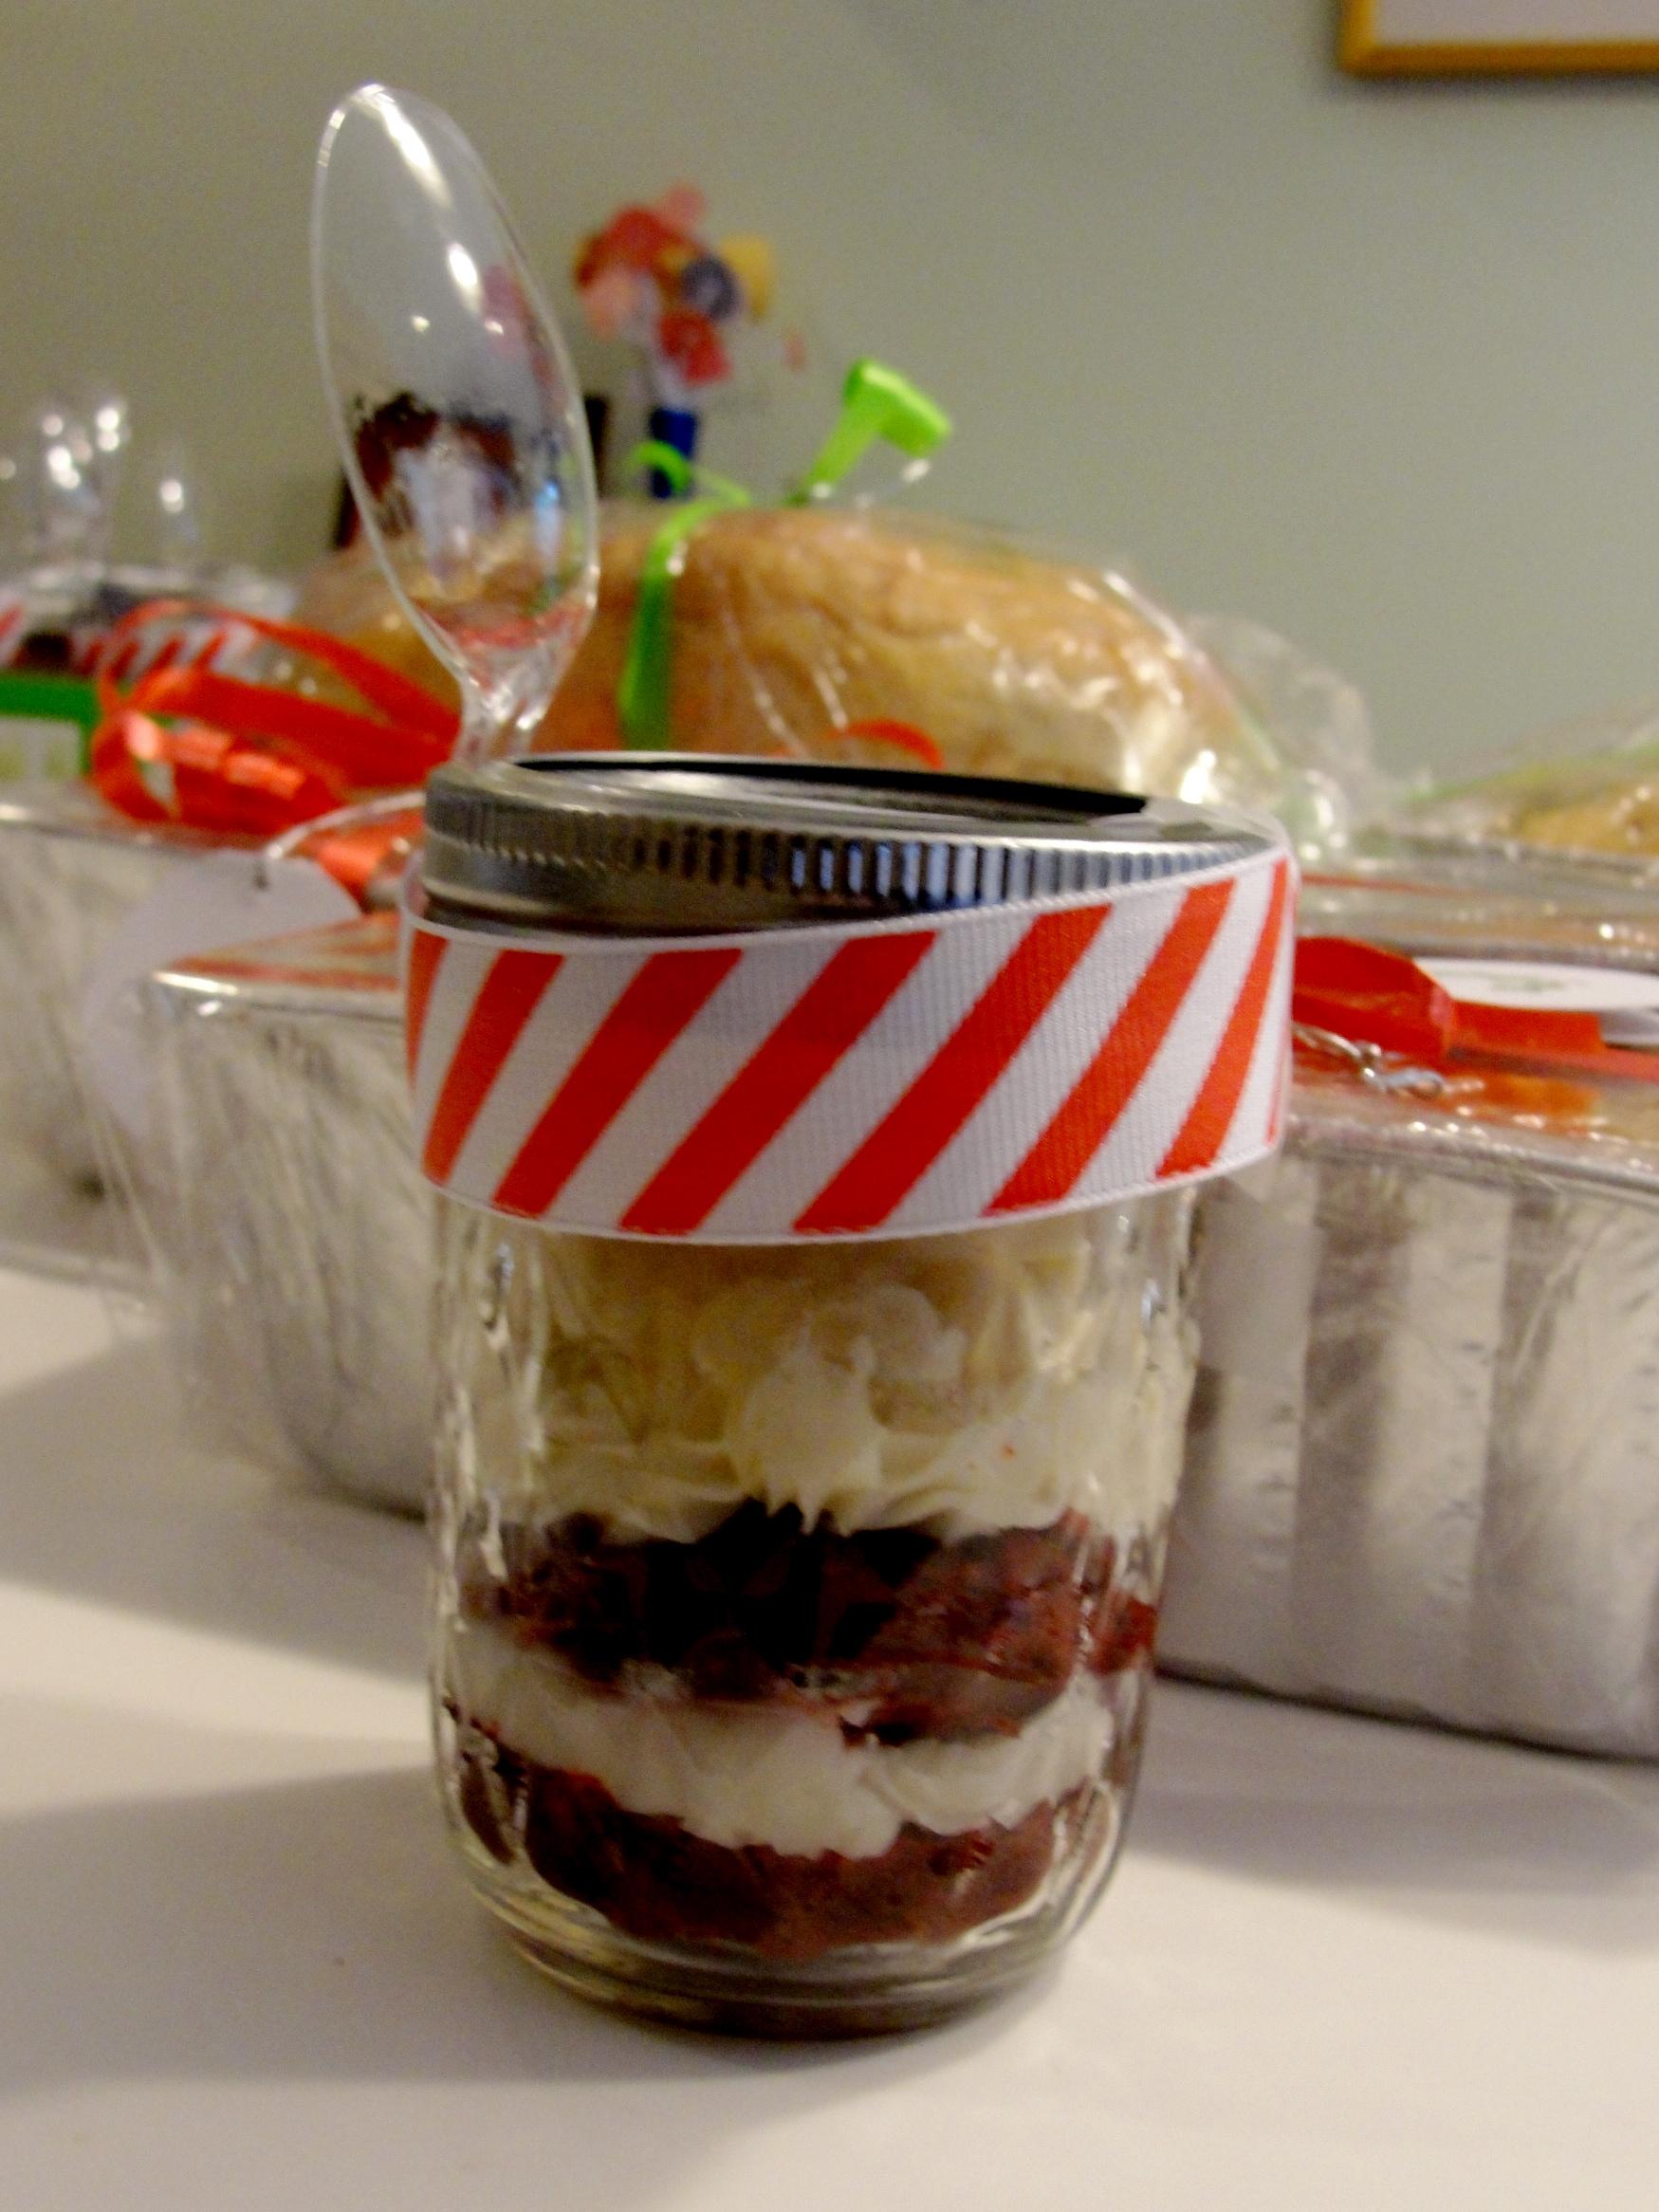 Sturdy Summer Bake Sale Ideas Reddit Bake This Bake Playing My Dinner Bake Sale Ideas nice food Bake Sale Ideas